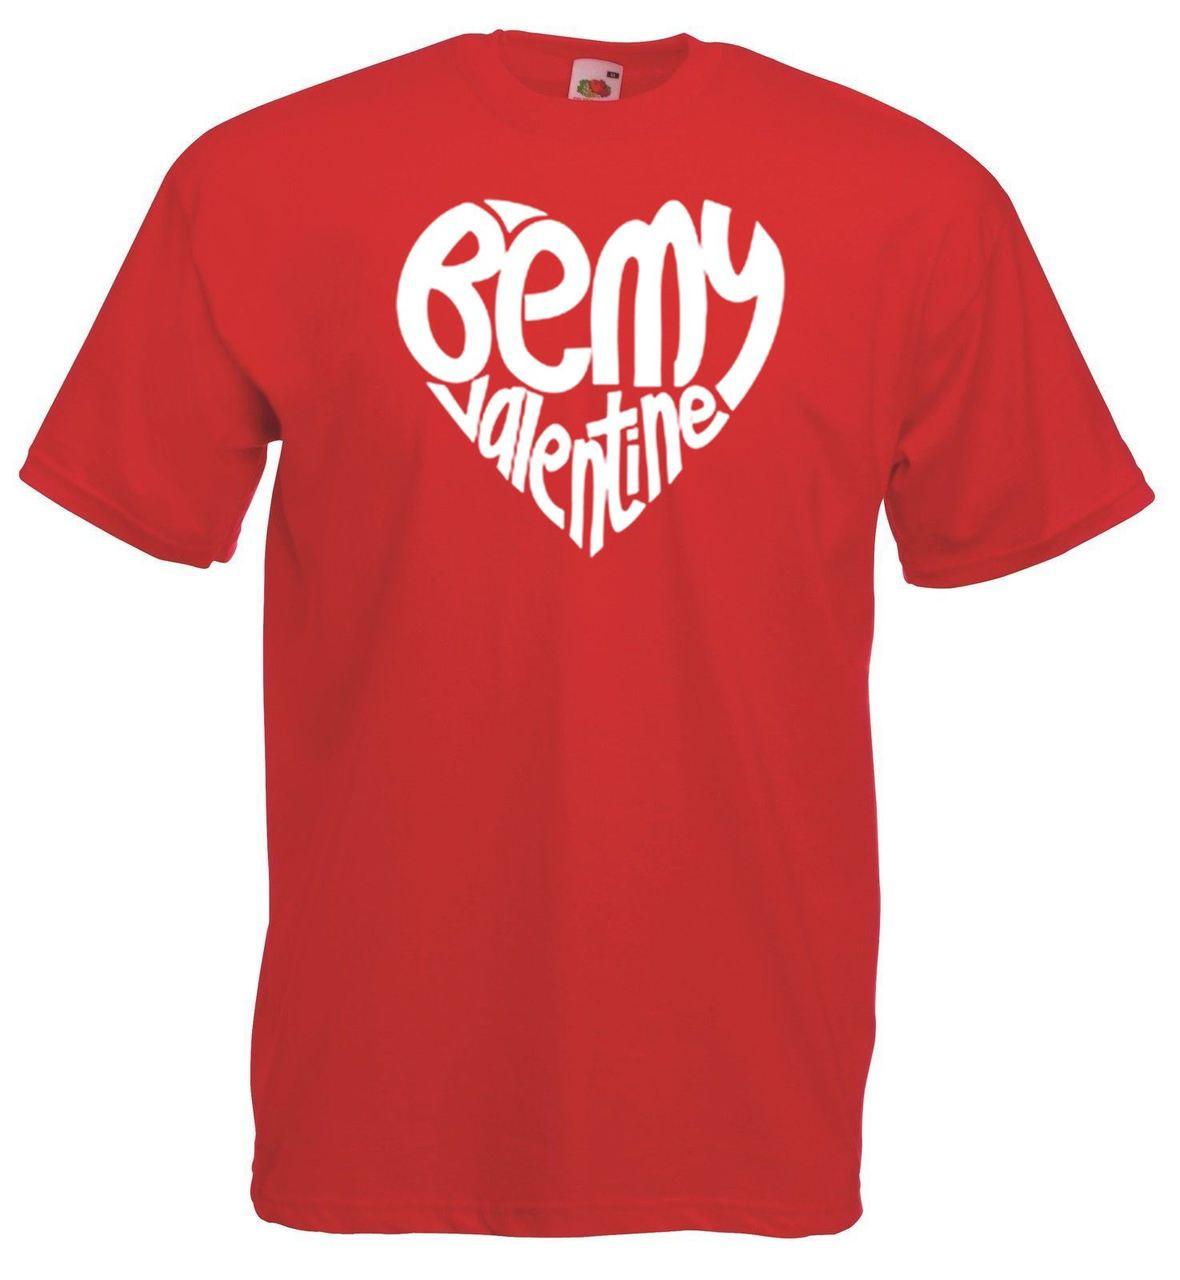 f3a76536a0 Unisex Red Be My Valentine T-Shirt Shirt Valentine's Valentines Day Romance  Love